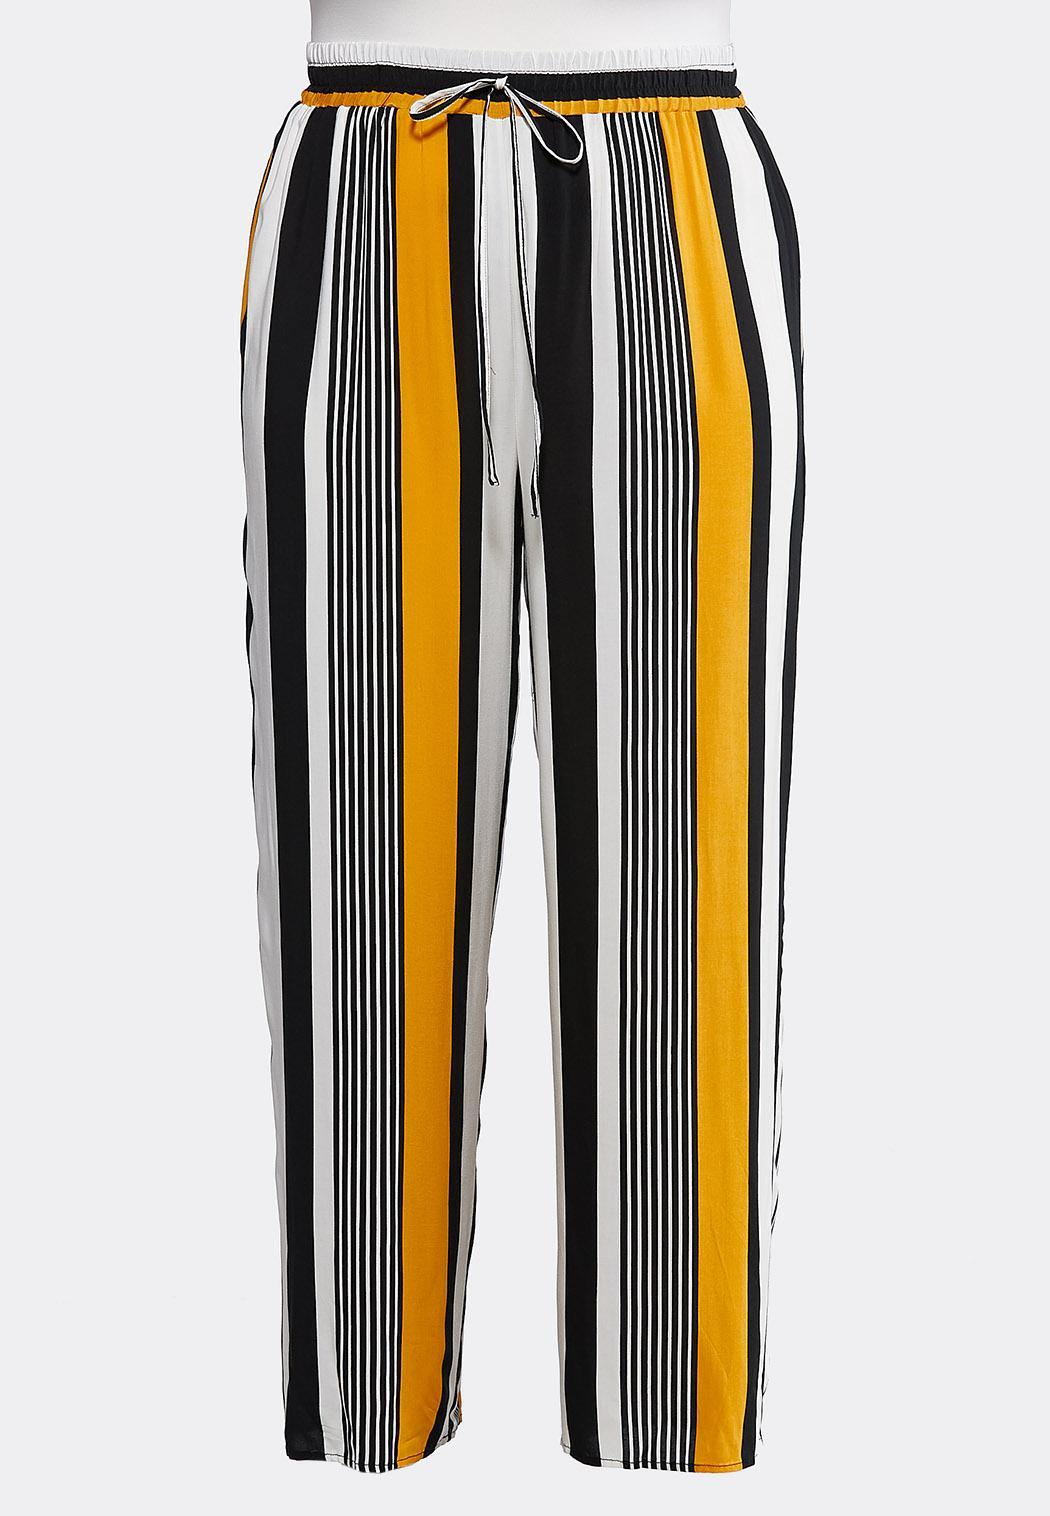 711e1ce98a17d6 Plus Size Golden Stripe Palazzo Pants Wide Leg Cato Fashions